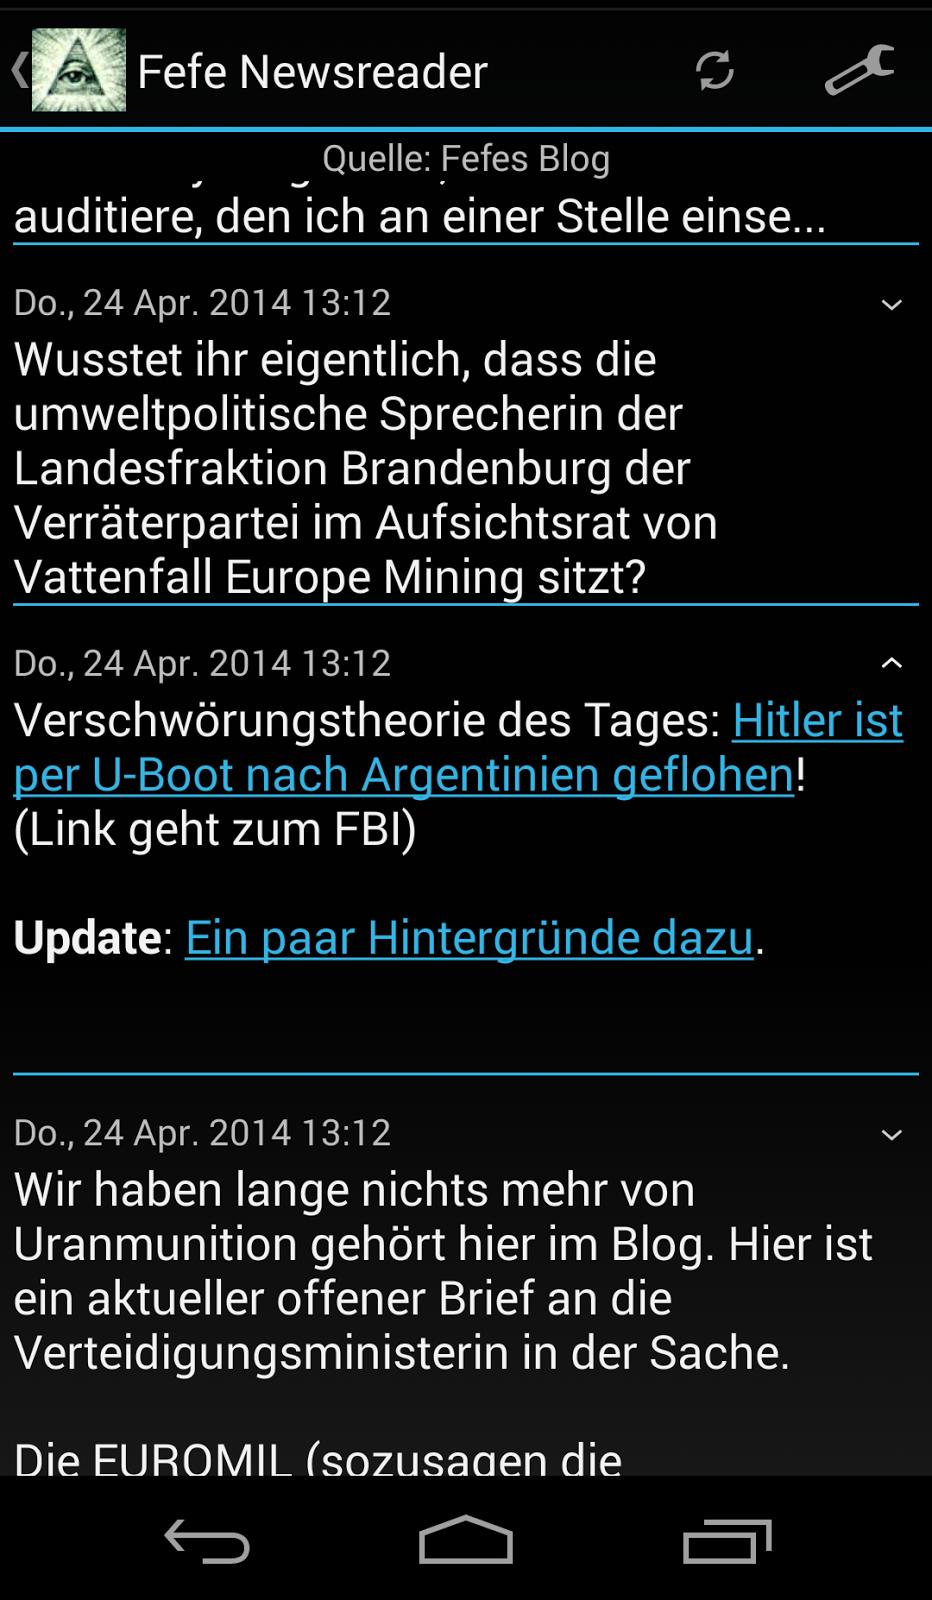 fefe newsreader android